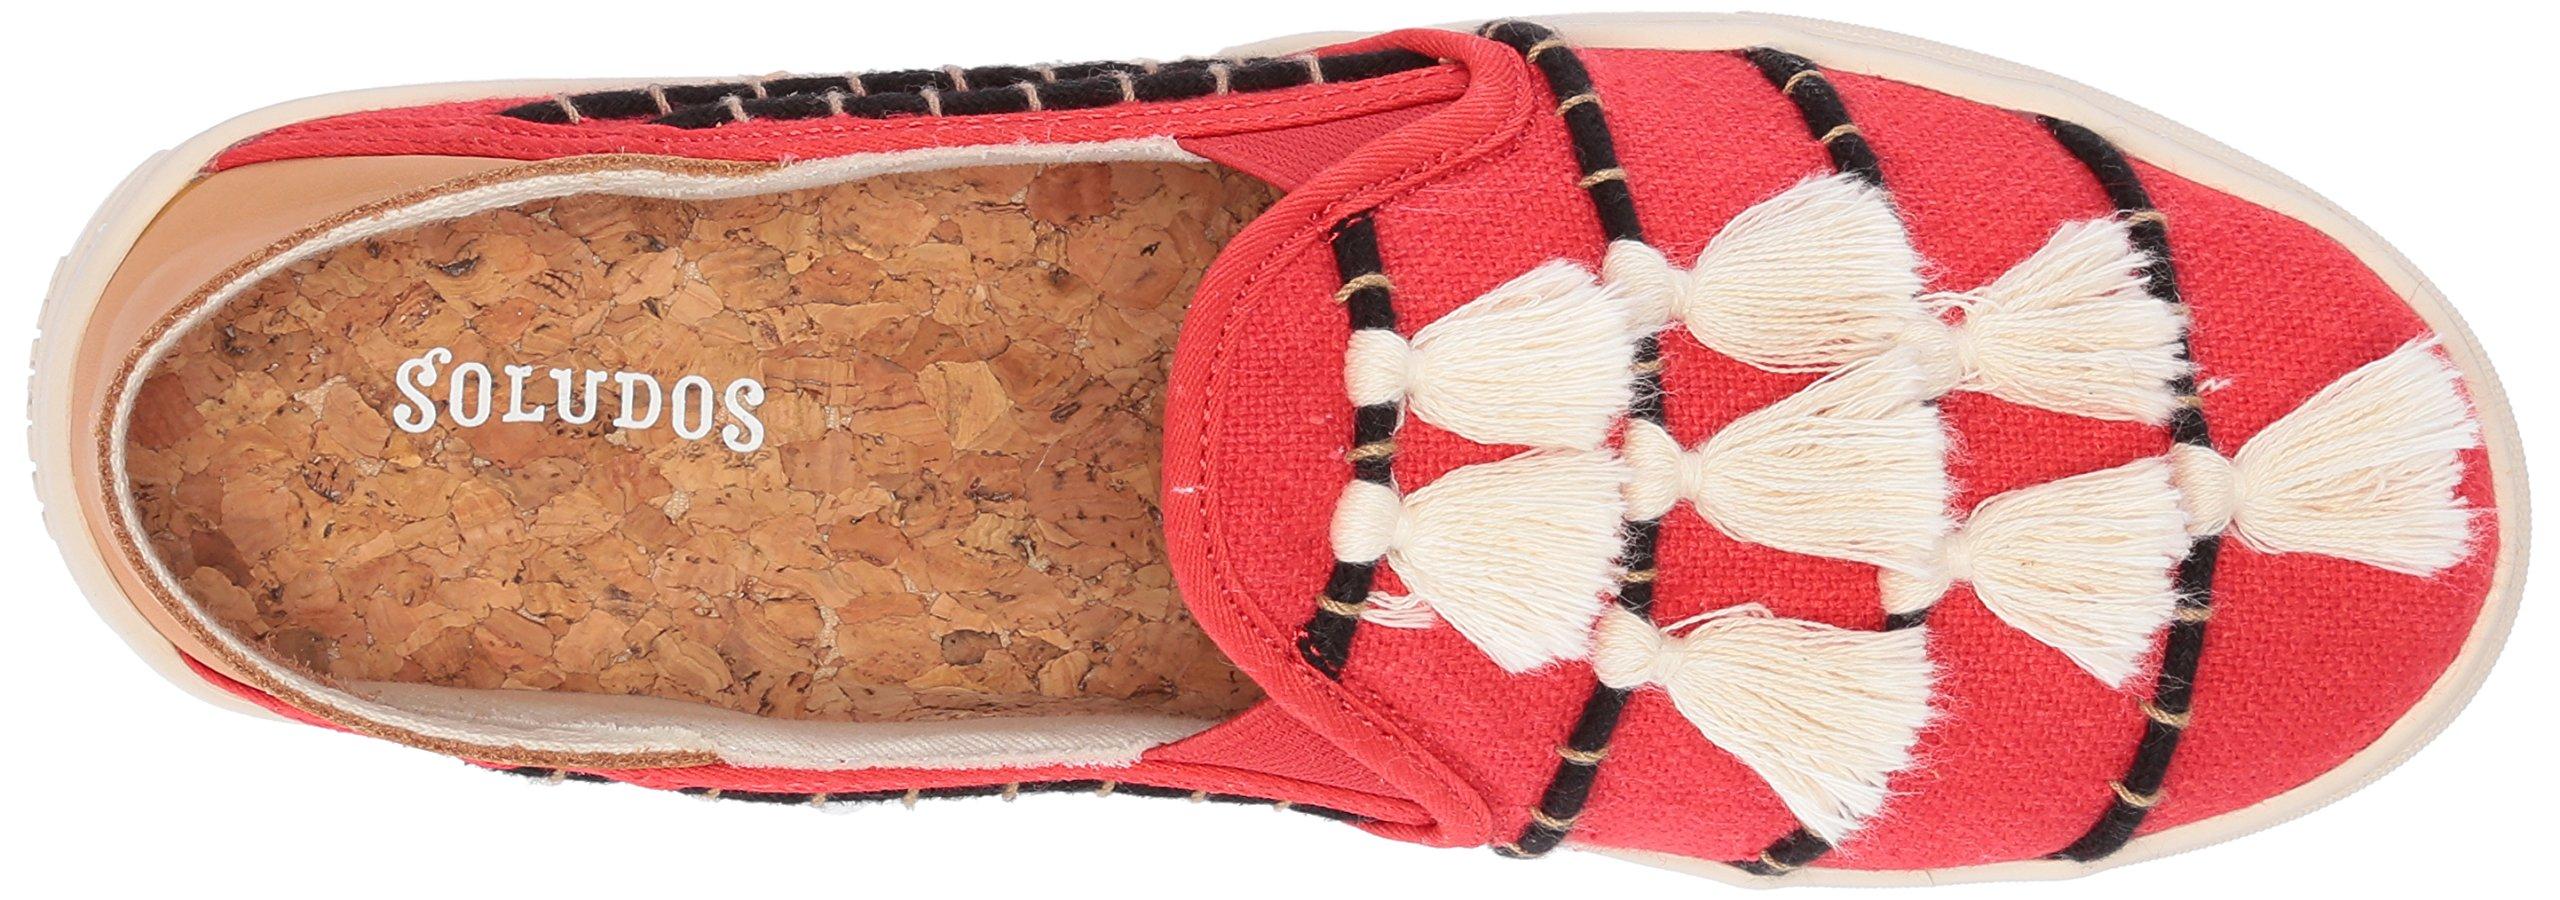 Soludos Women's Tassel Slip Sneaker, Red/Beige, 8 B US by Soludos (Image #8)